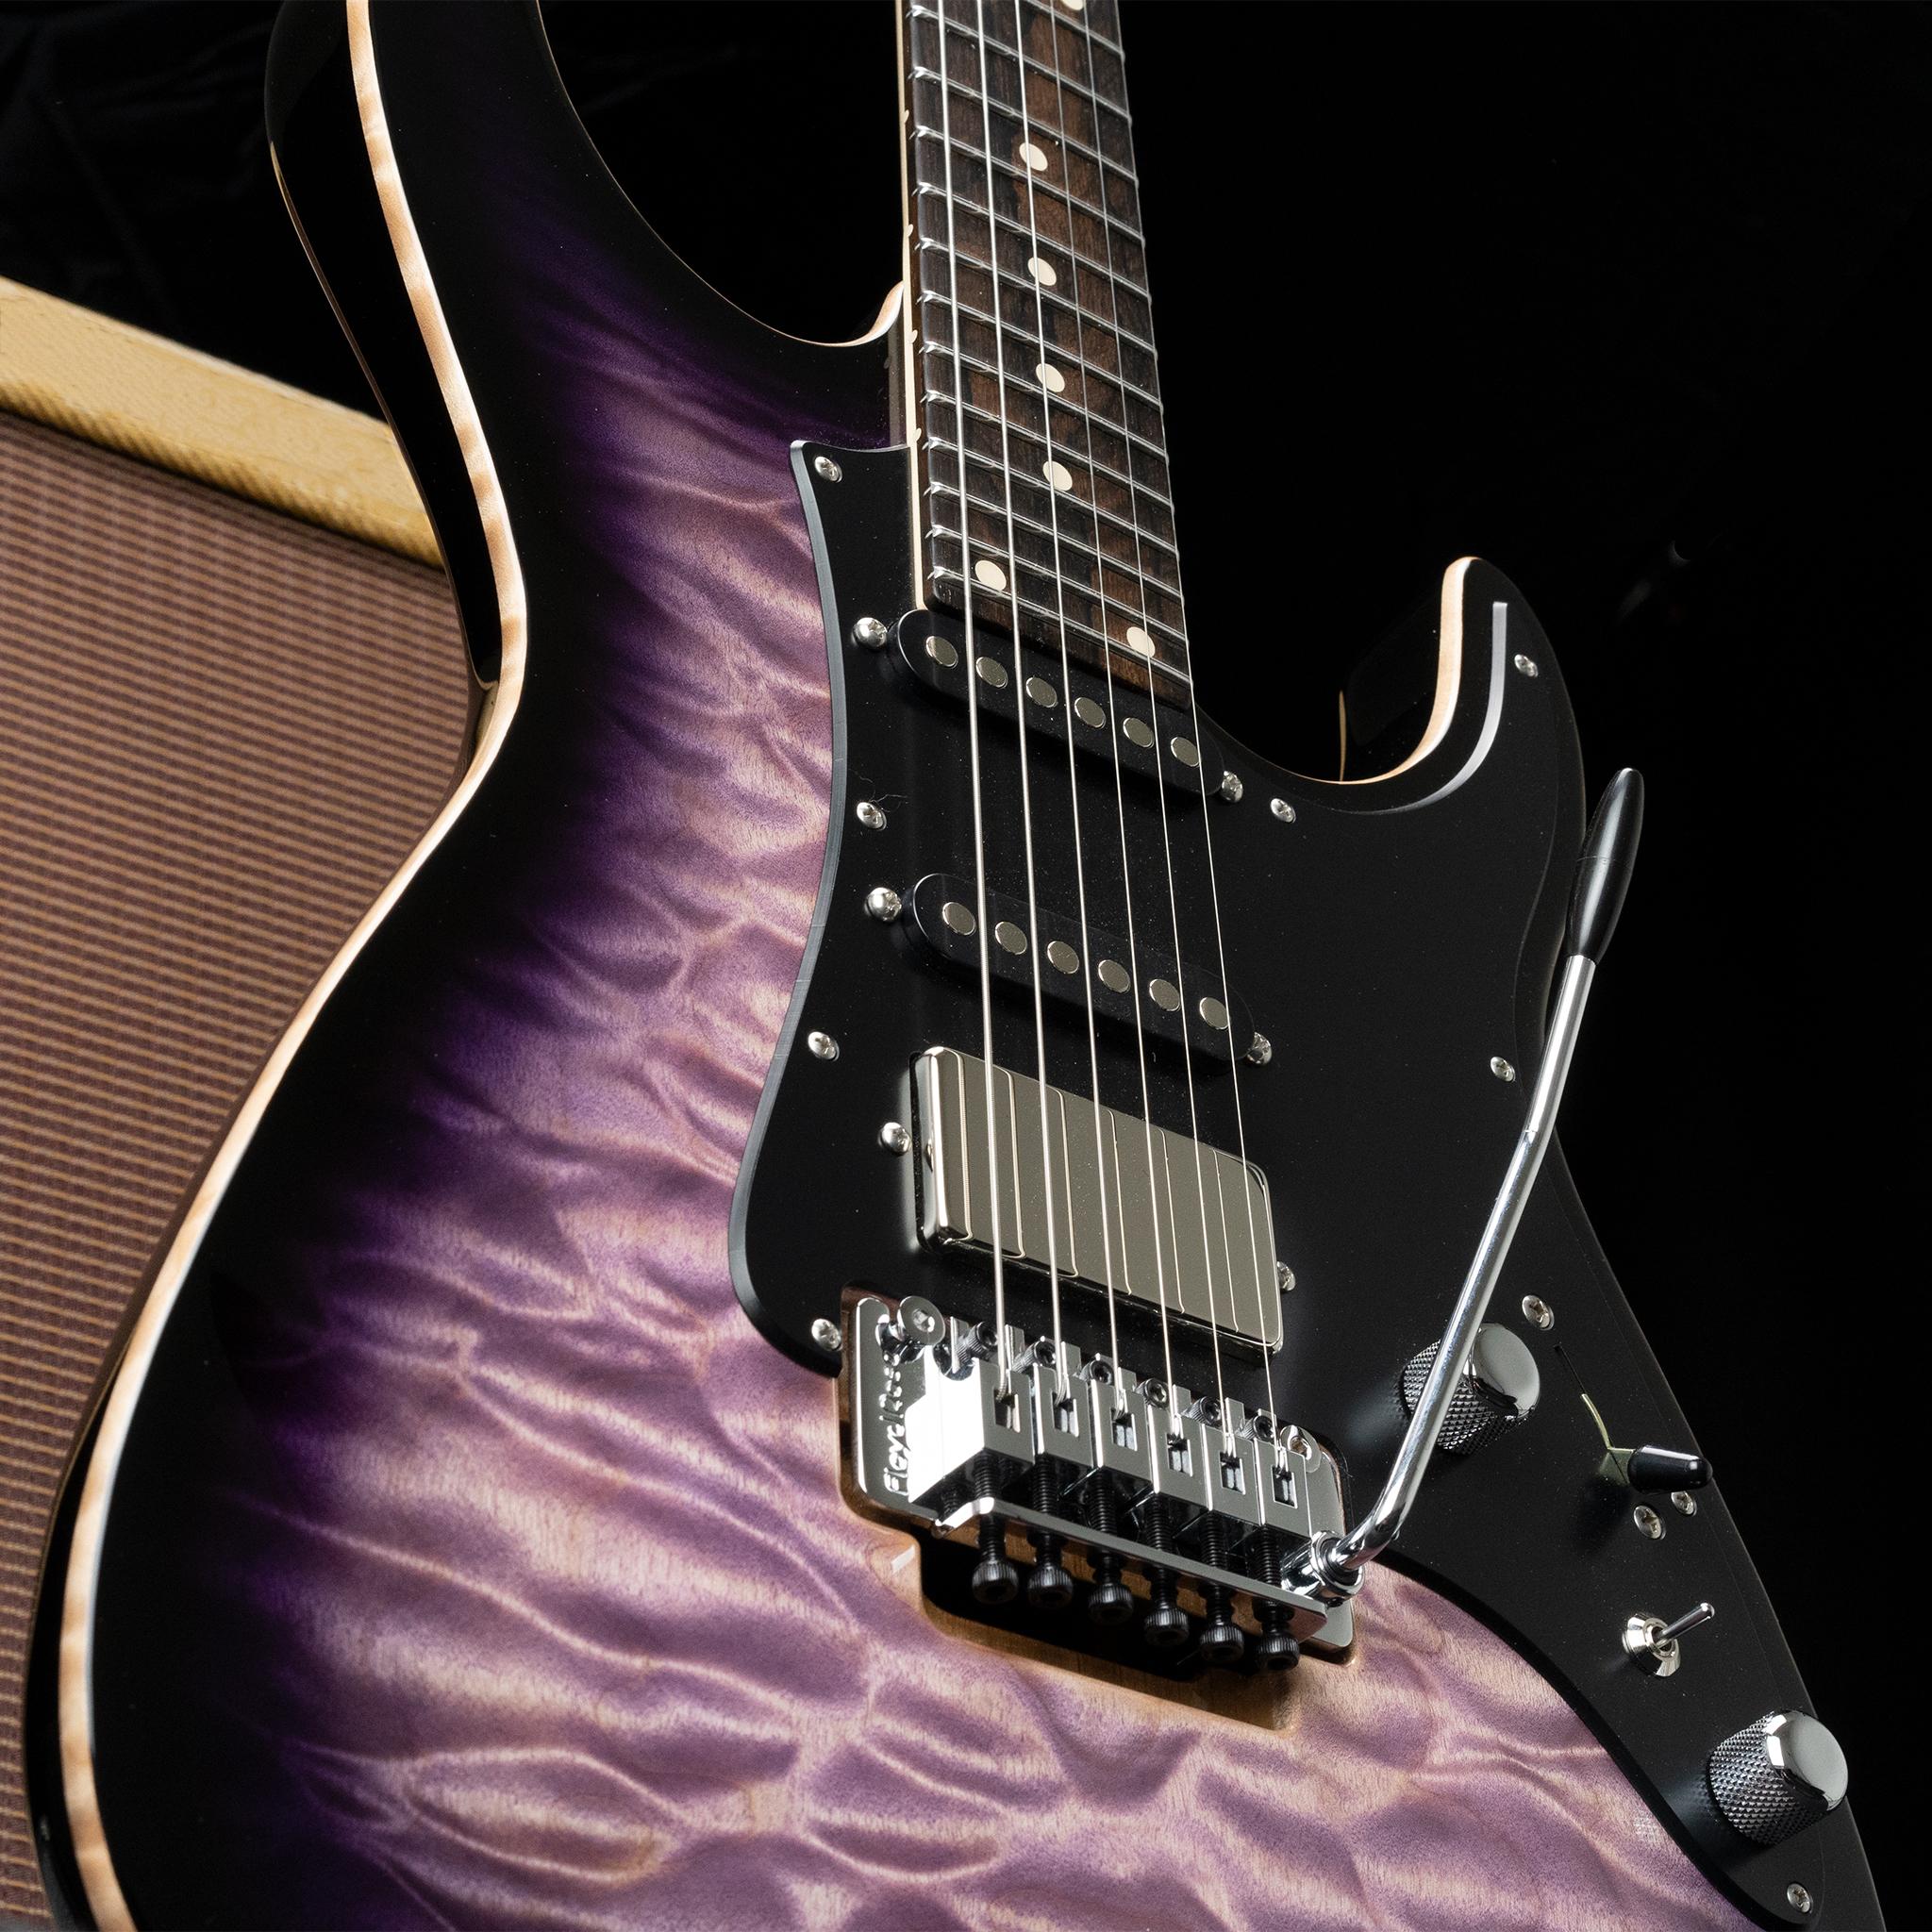 01-11-19P_bcup_Guardian Angel_Natural Purple to T-Purple to Black Burst_2048.jpg